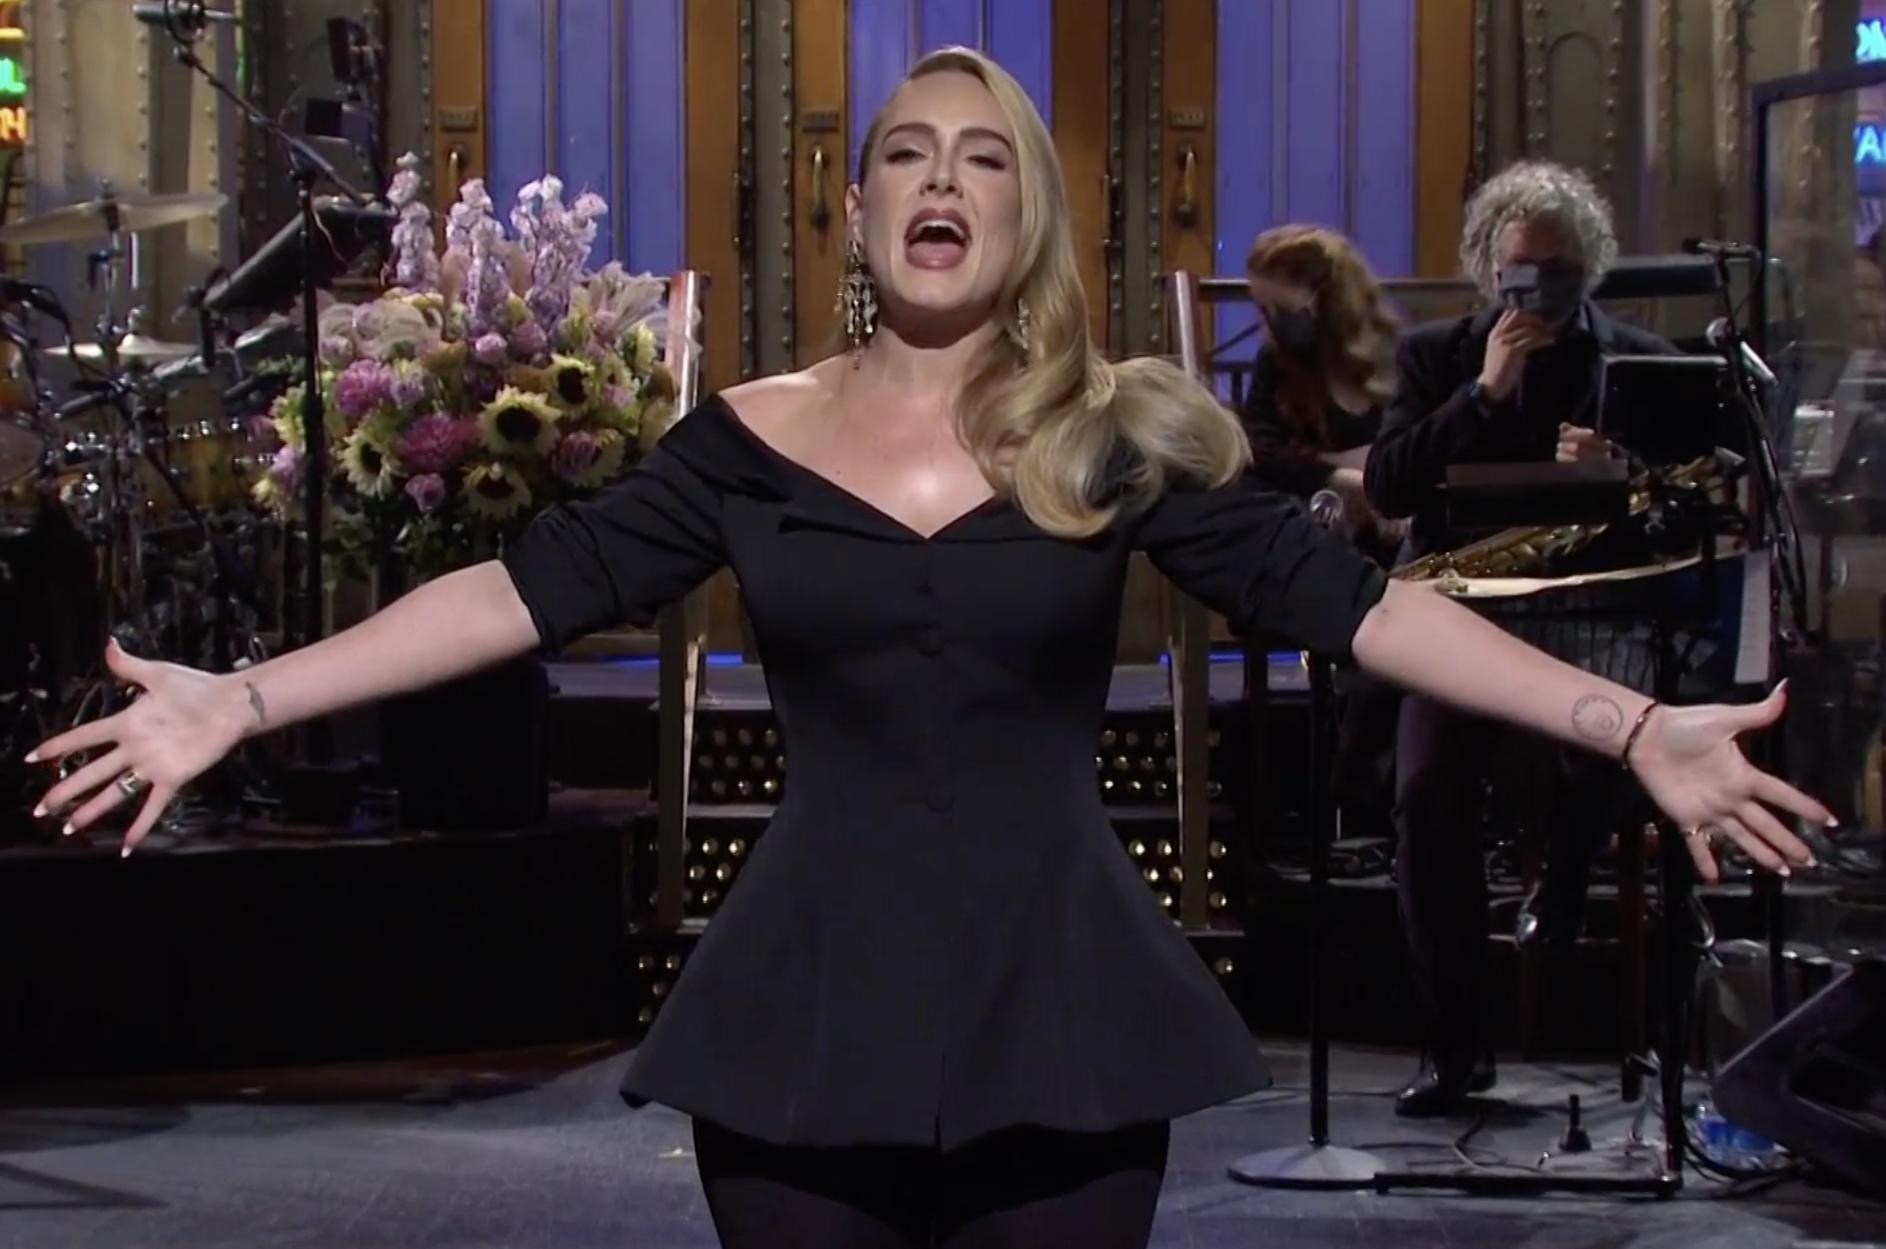 Snl Season 46 Episode 4 Recap Adele Hosts With Musical Guest H E R Ew Com